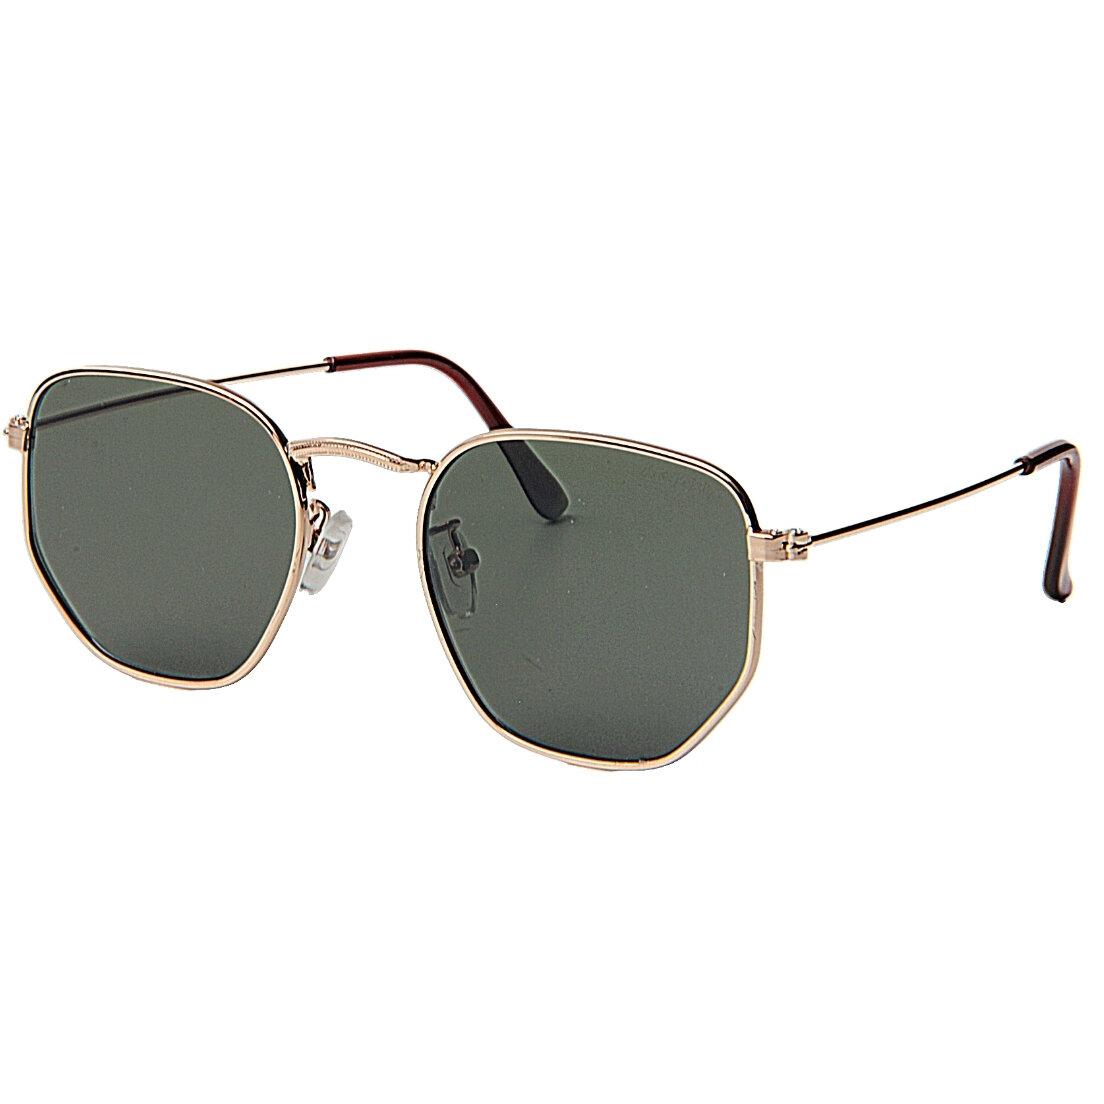 OUTLET - Óculos de Sol Khatto Shape Hexagonal